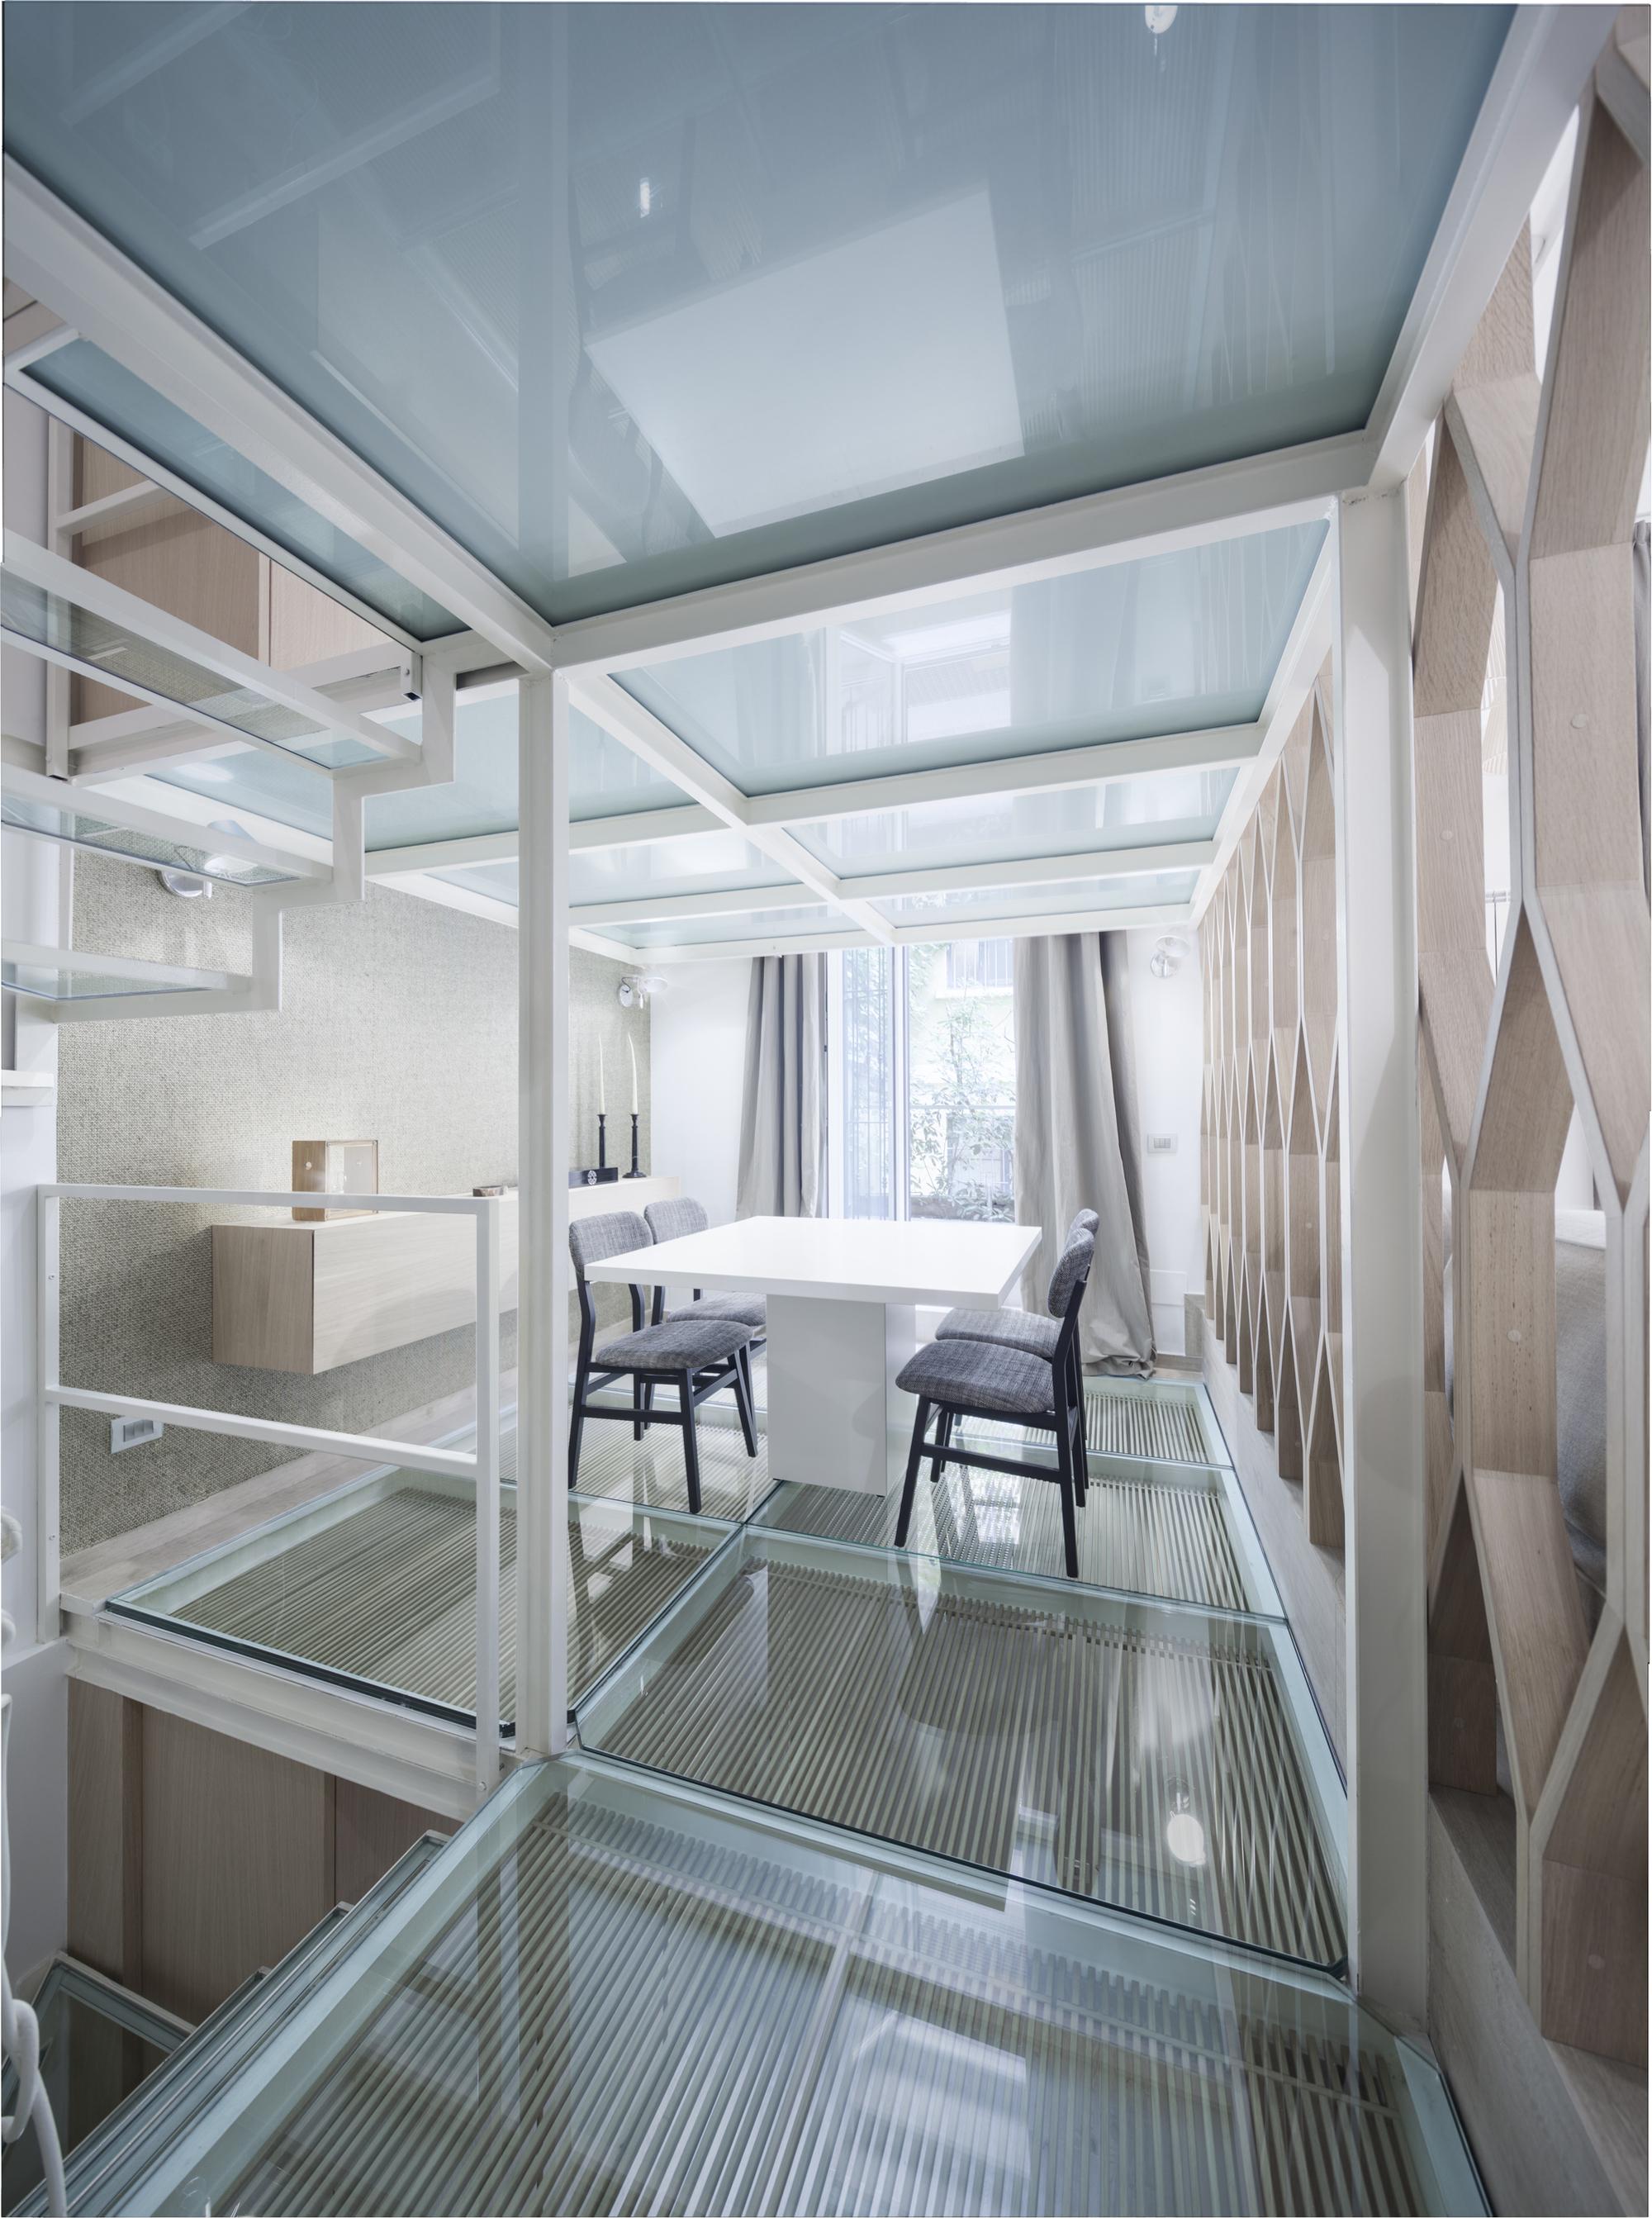 Casa & Co Milazzo apartment interiors architecture and design by